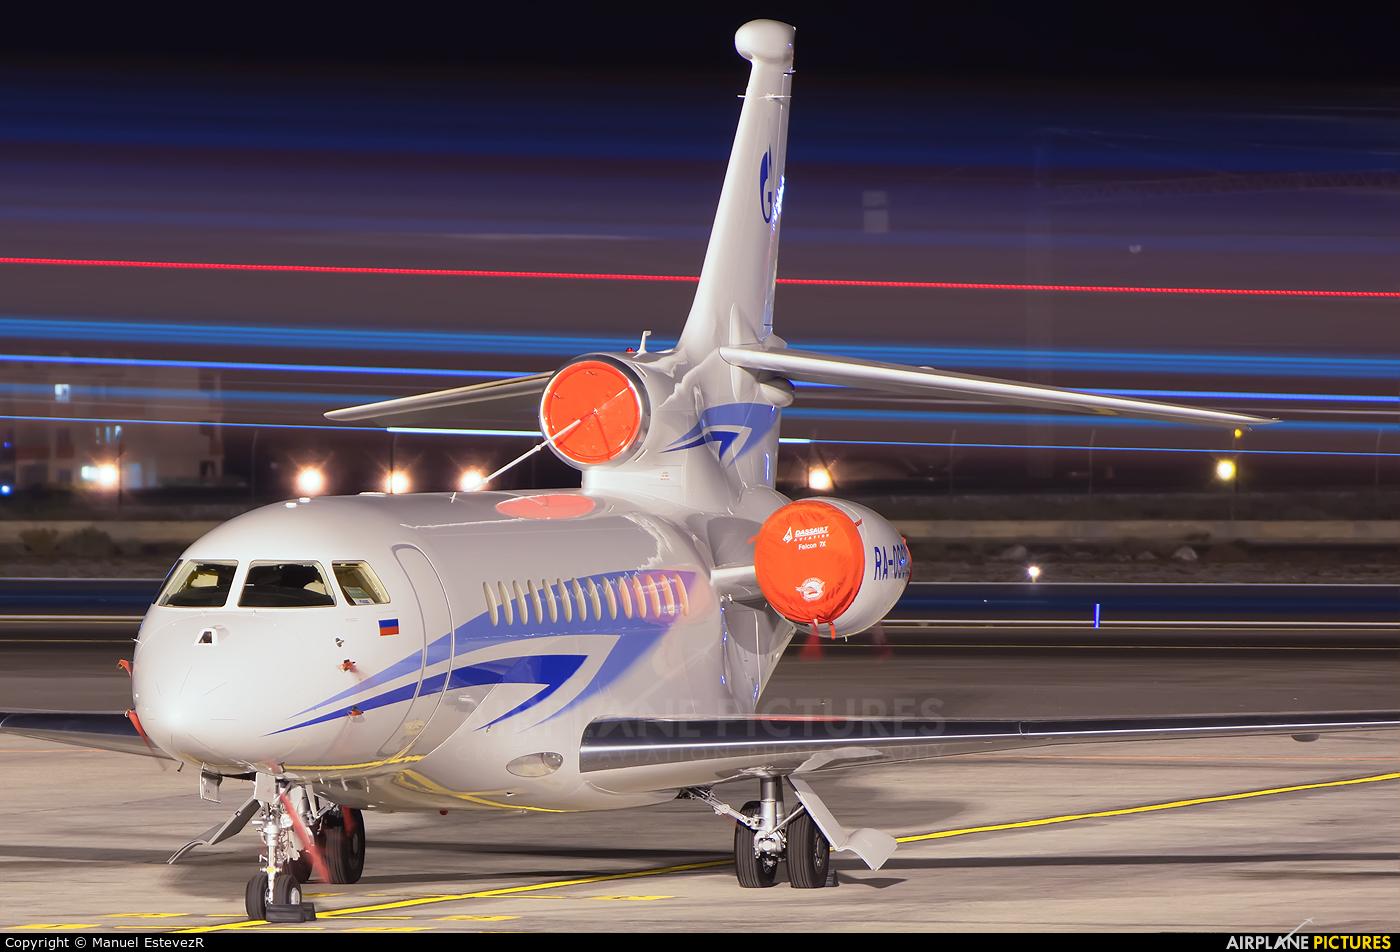 Gazpromavia RA-09602 aircraft at Tenerife Sur - Reina Sofia